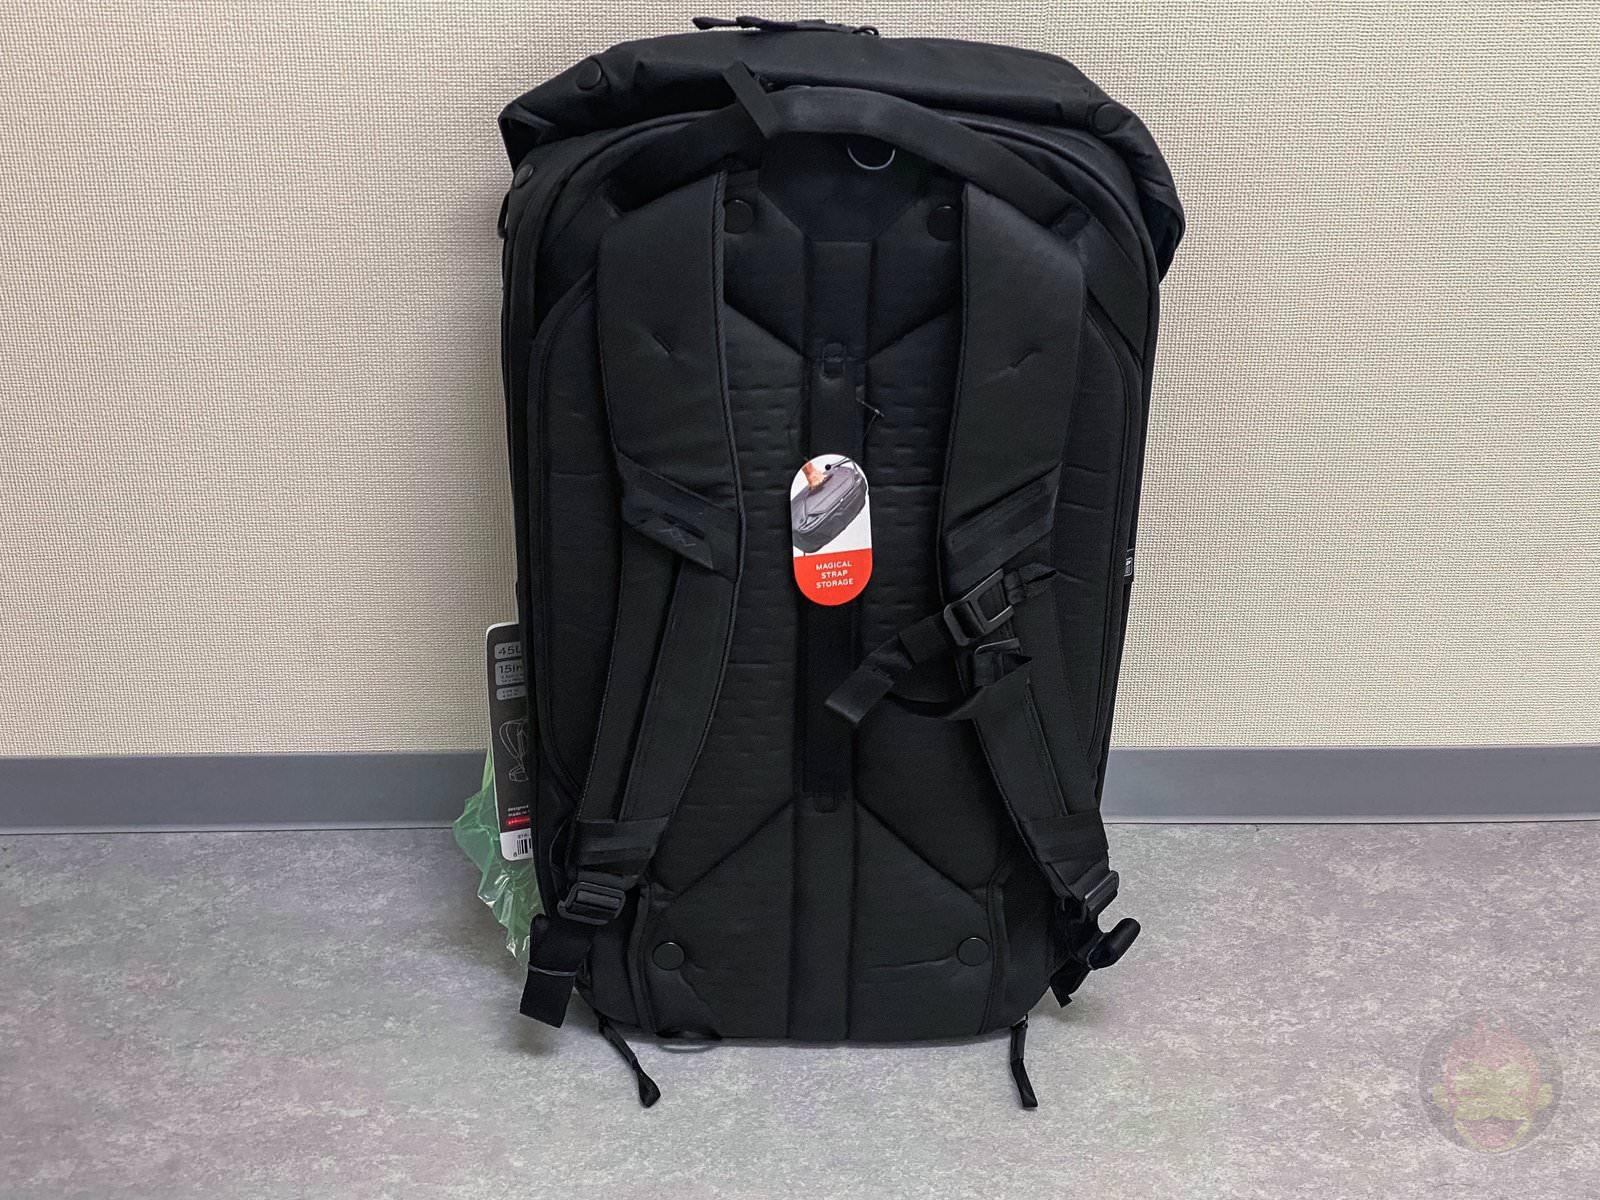 Kickstarter-bought-bag-came-back-as-a-new-bag-03.jpg